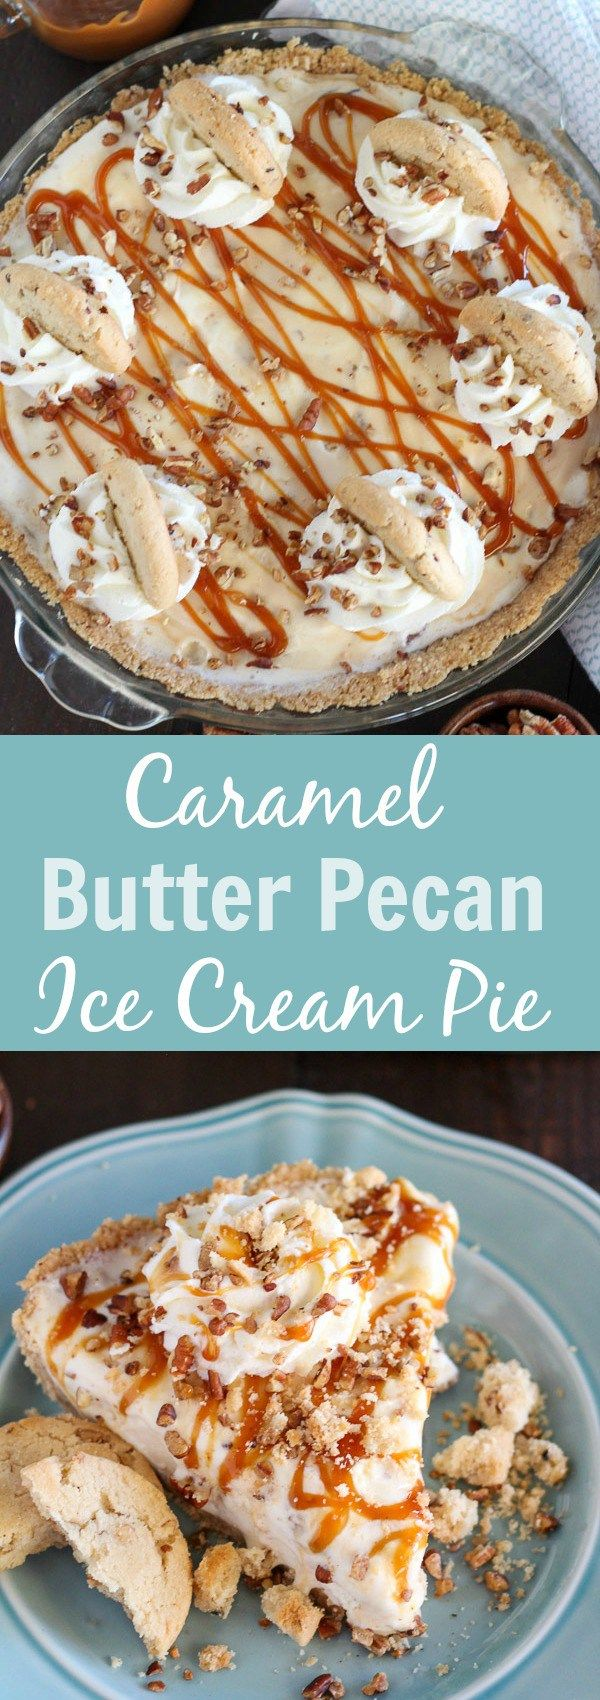 Caramel Butter Pecan Ice Cream Pie